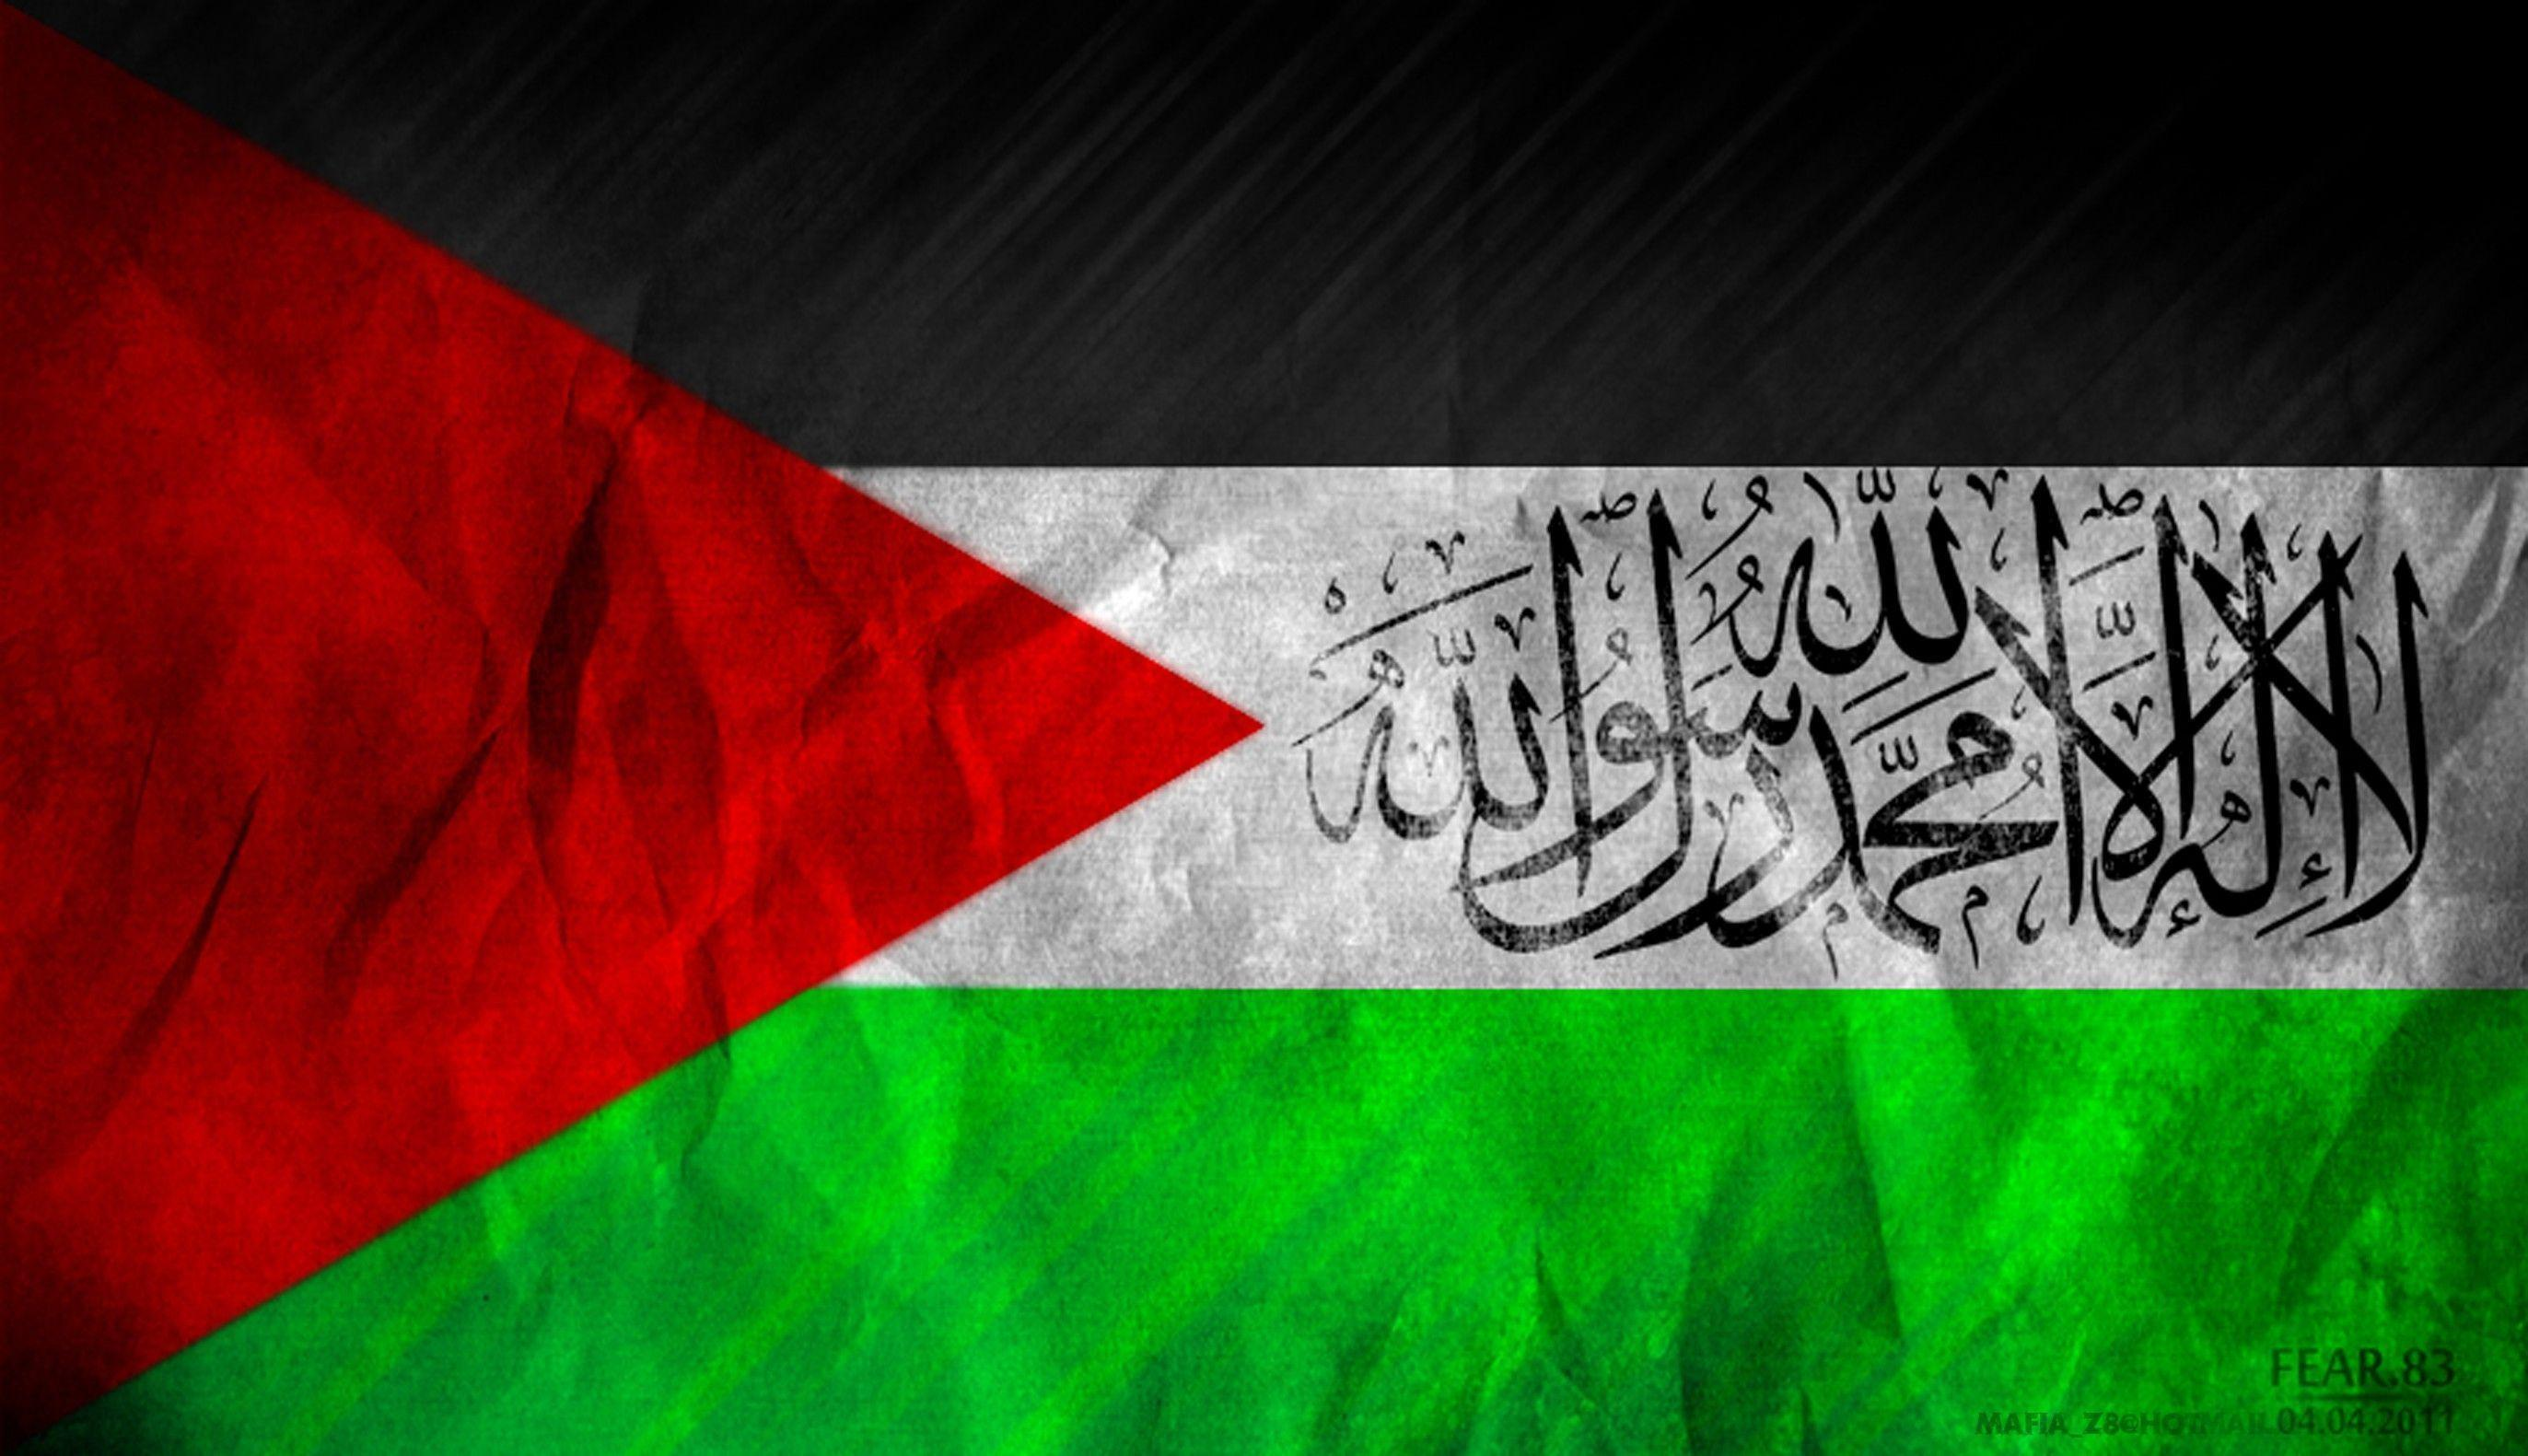 Israel Flag Wallpaper Hd Palestine Wallpapers Wallpaper Cave